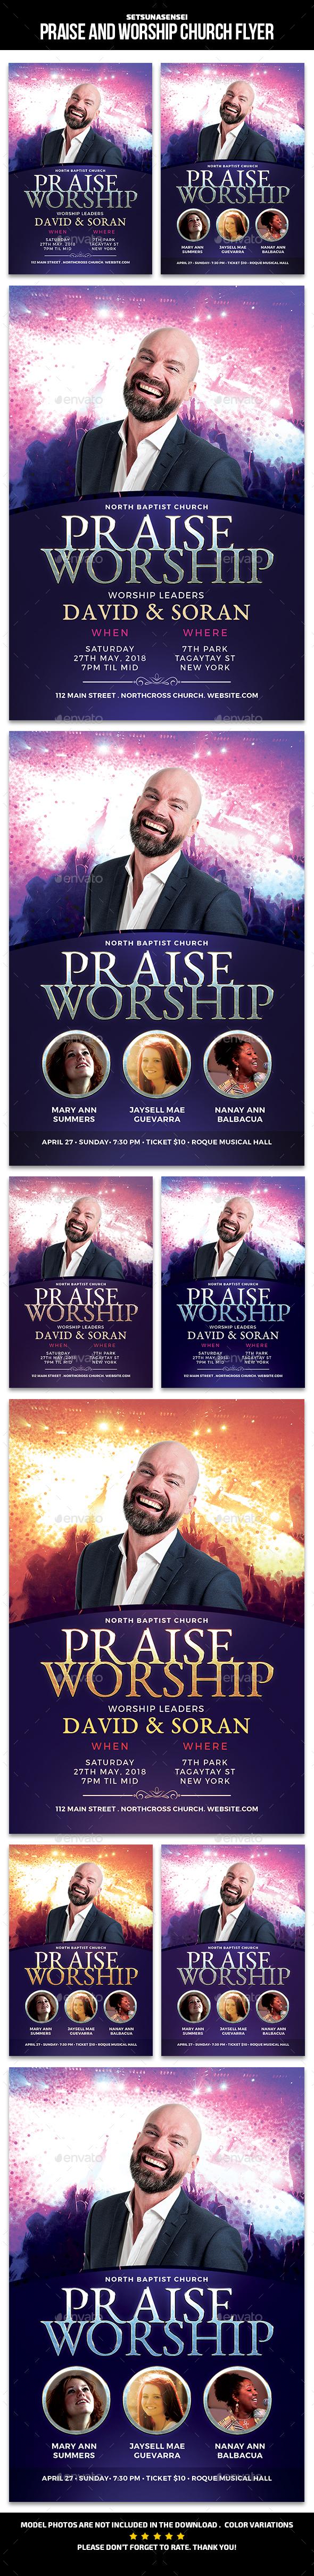 Praise Worship Church Flyer - Church Flyers